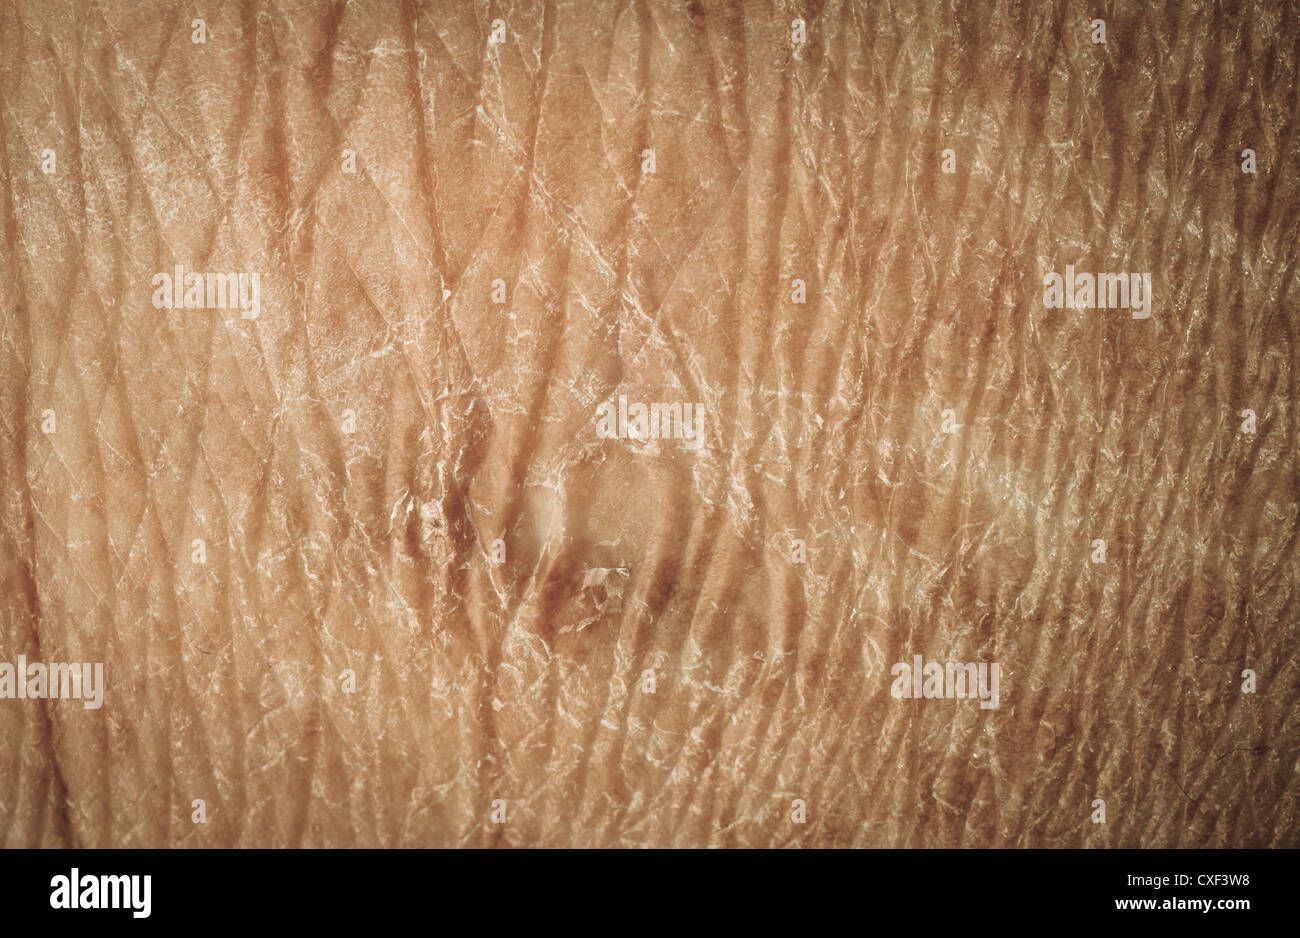 dry skin texture Stock Photo